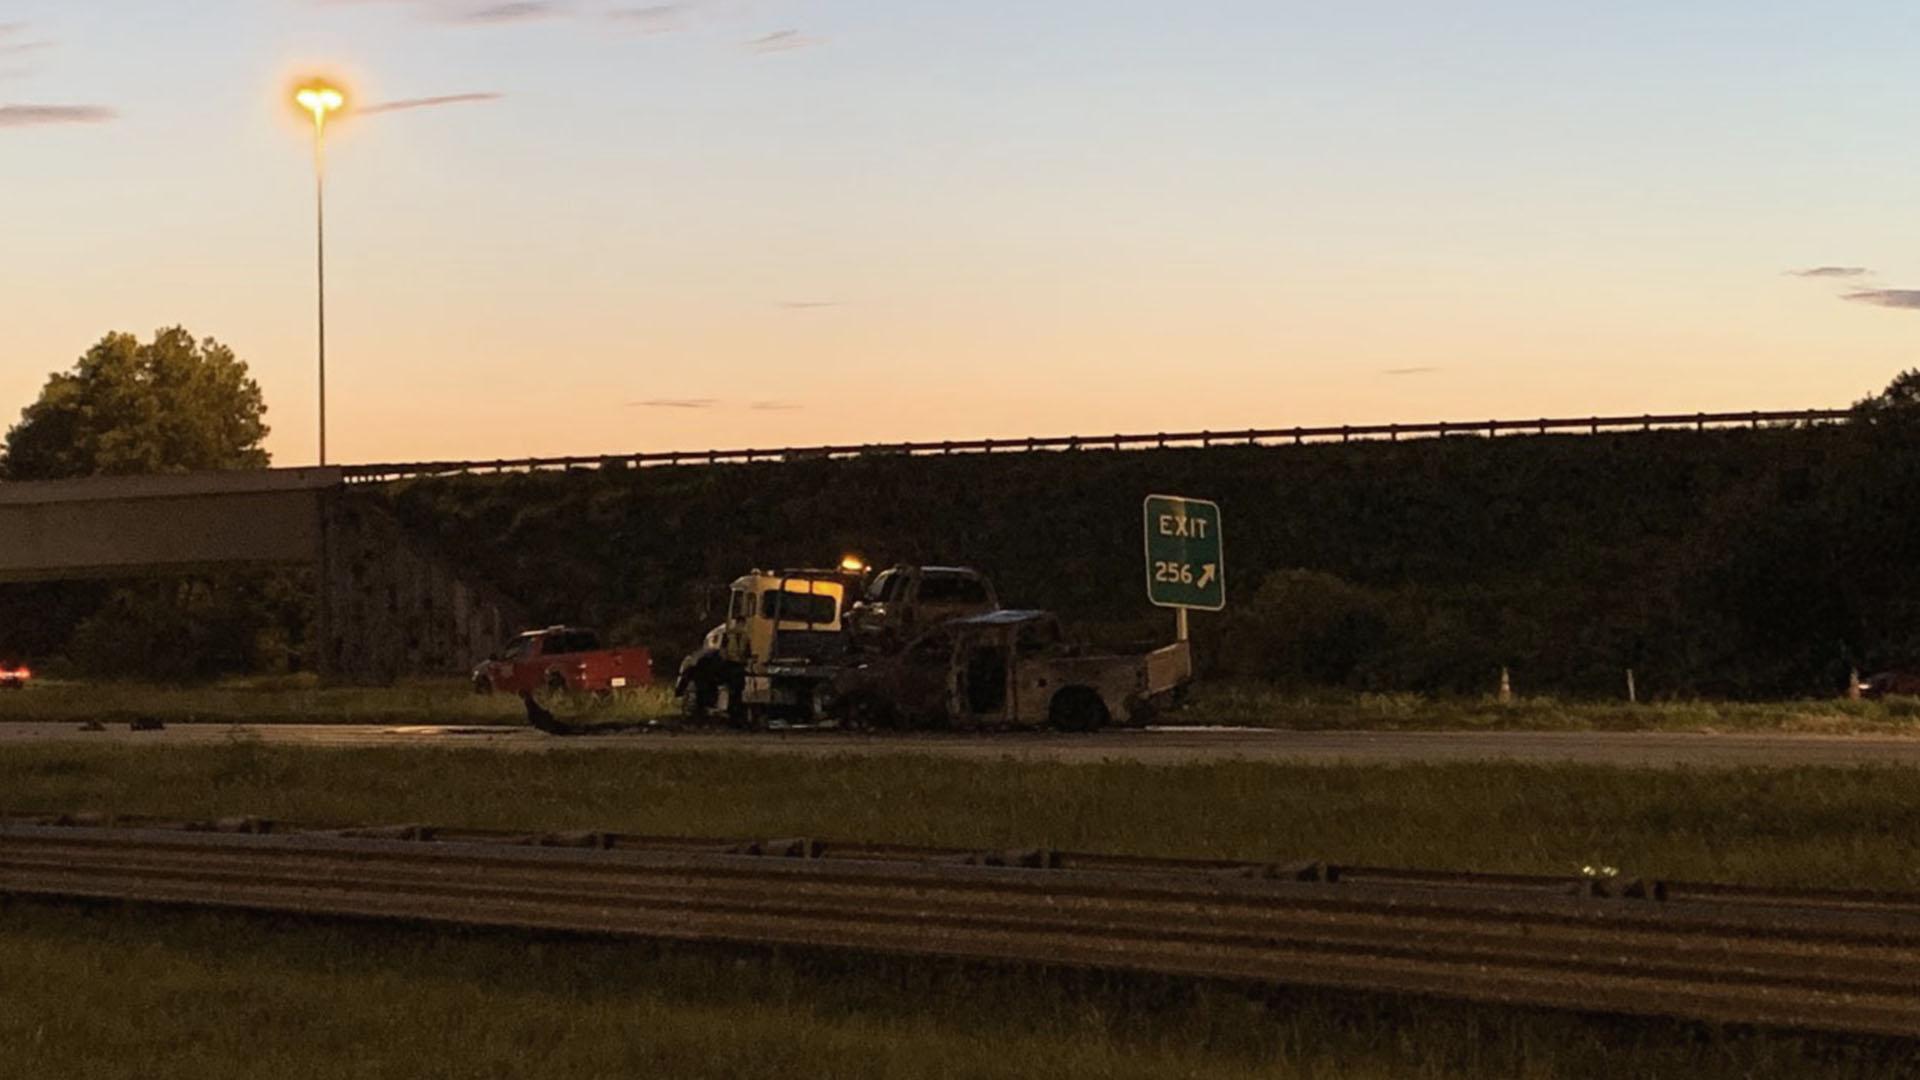 Victim identified following fatal I-75 crash in Hillsborough County